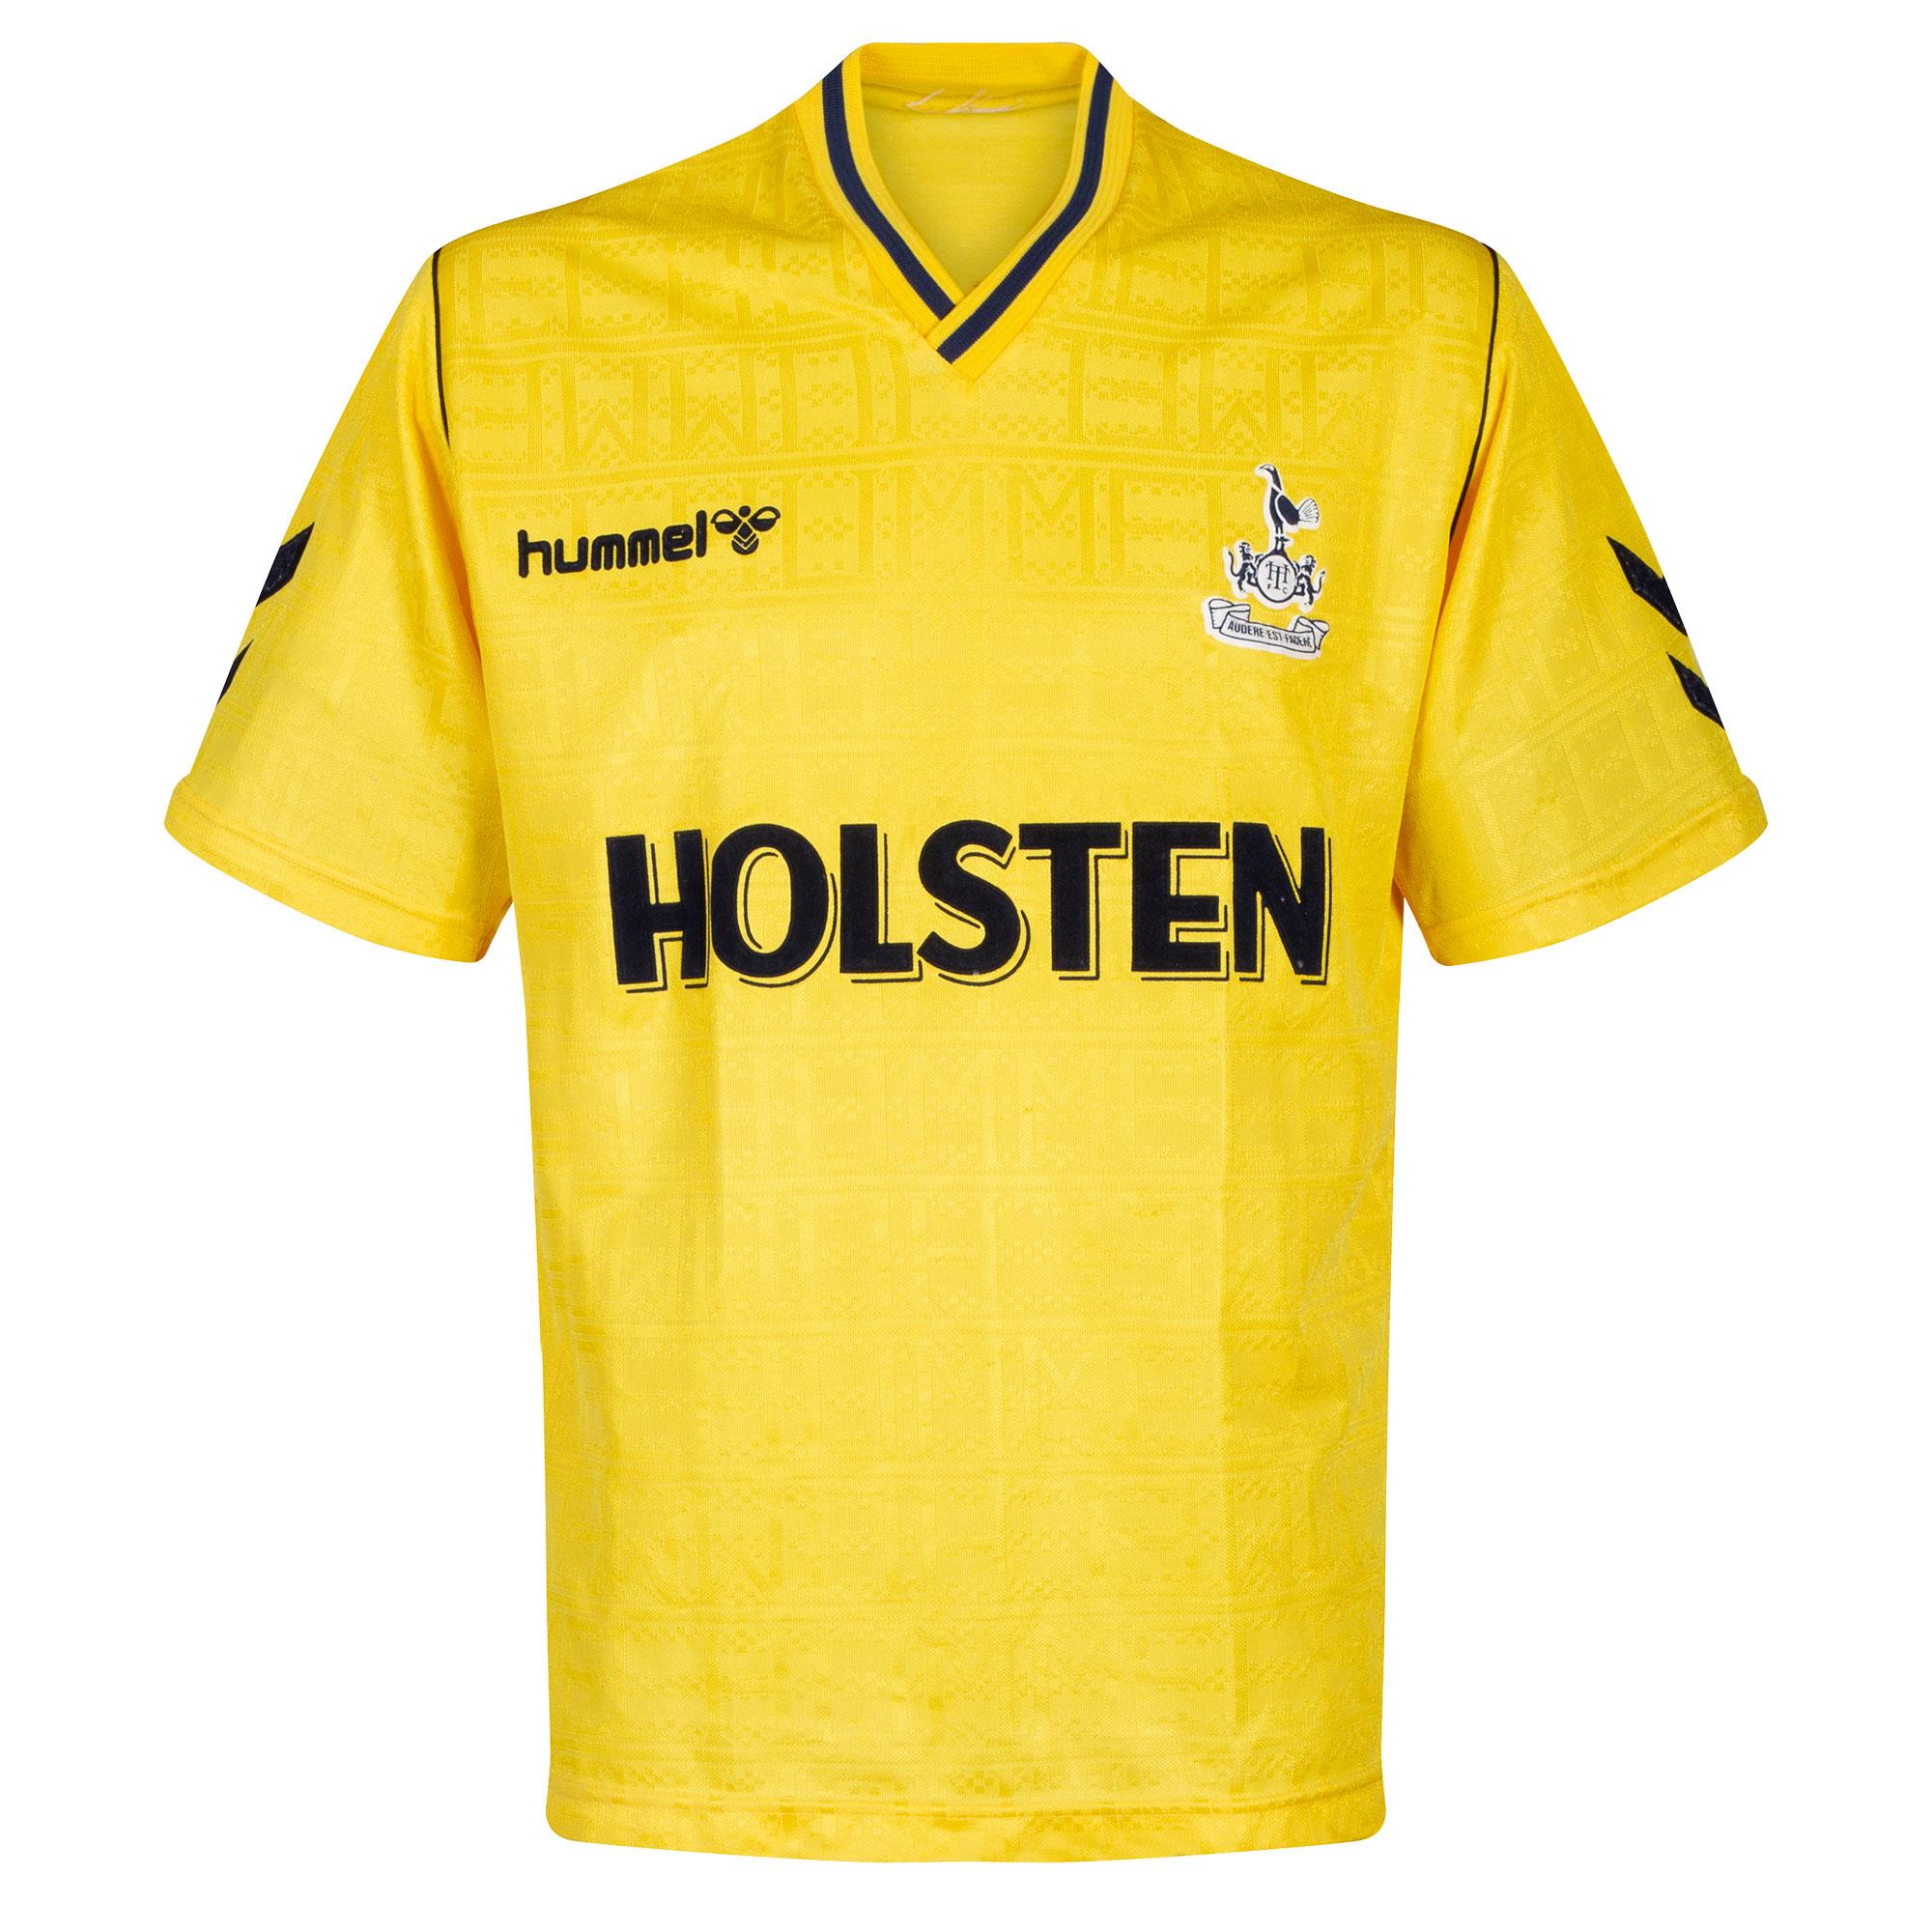 Hummel Tottenham Hotspur 1988-1991 Away Shirt - USED Condition (Great) - Size M